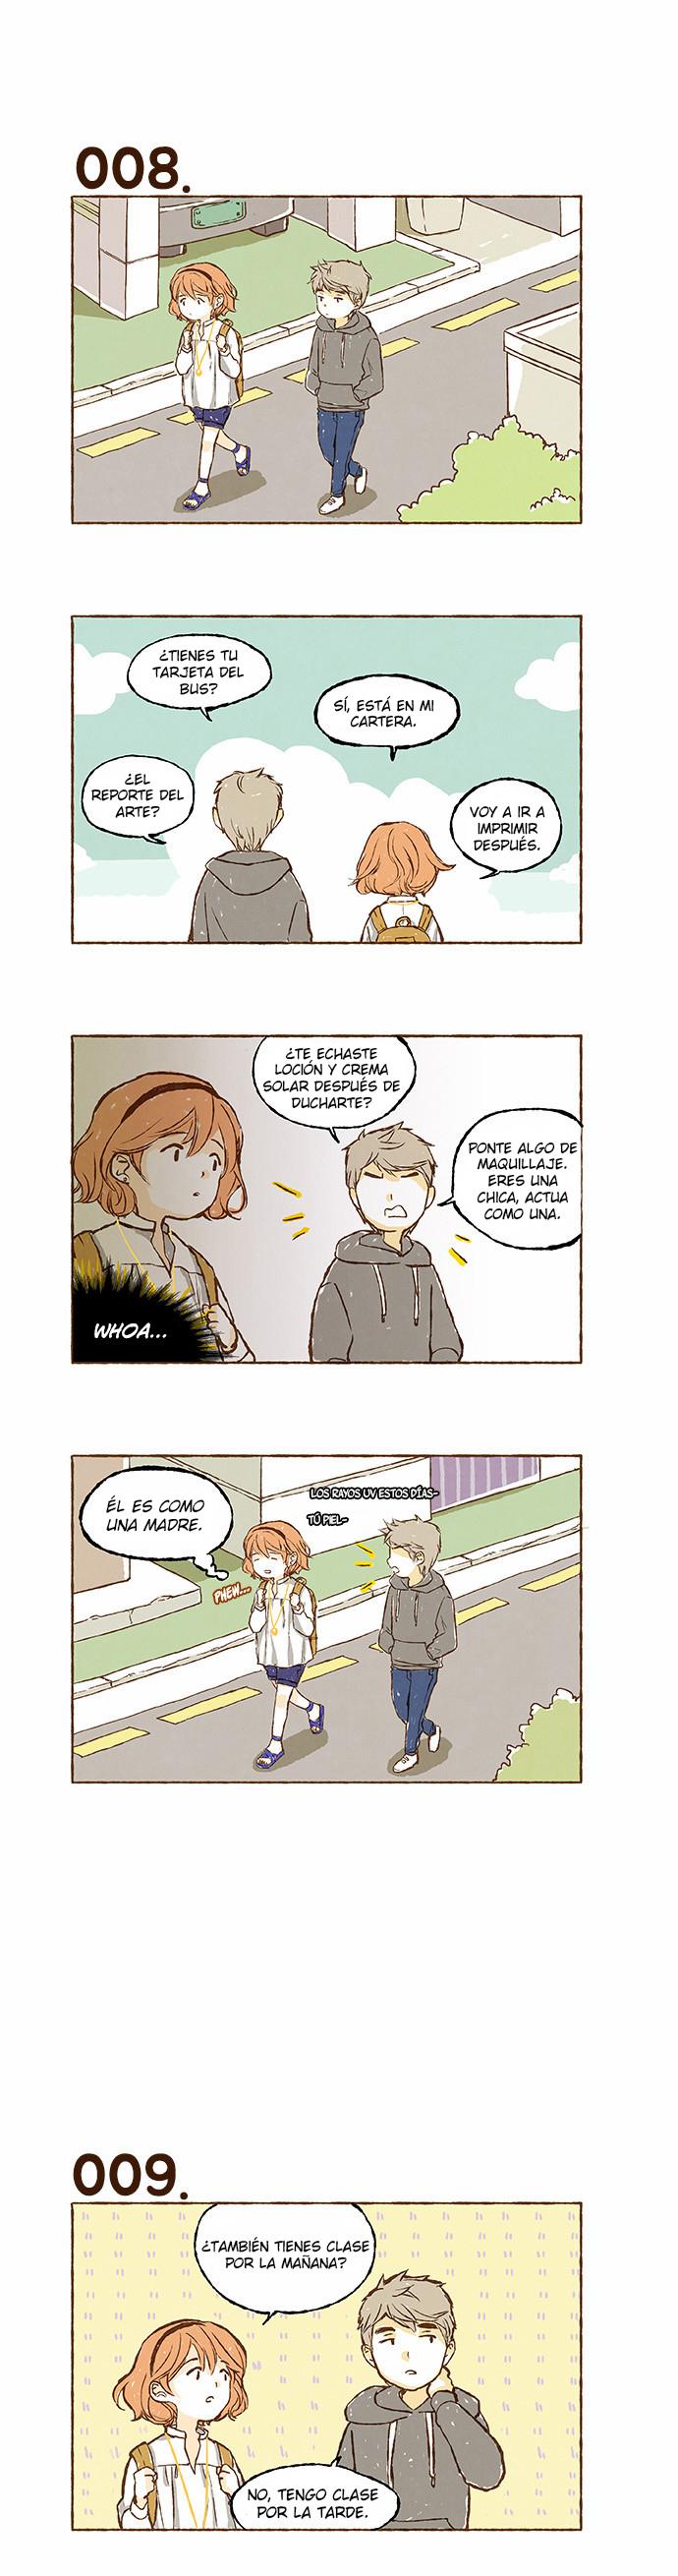 http://c5.ninemanga.com/es_manga/61/17725/462936/af68483d43493f6d67dad624646ff1d9.jpg Page 4